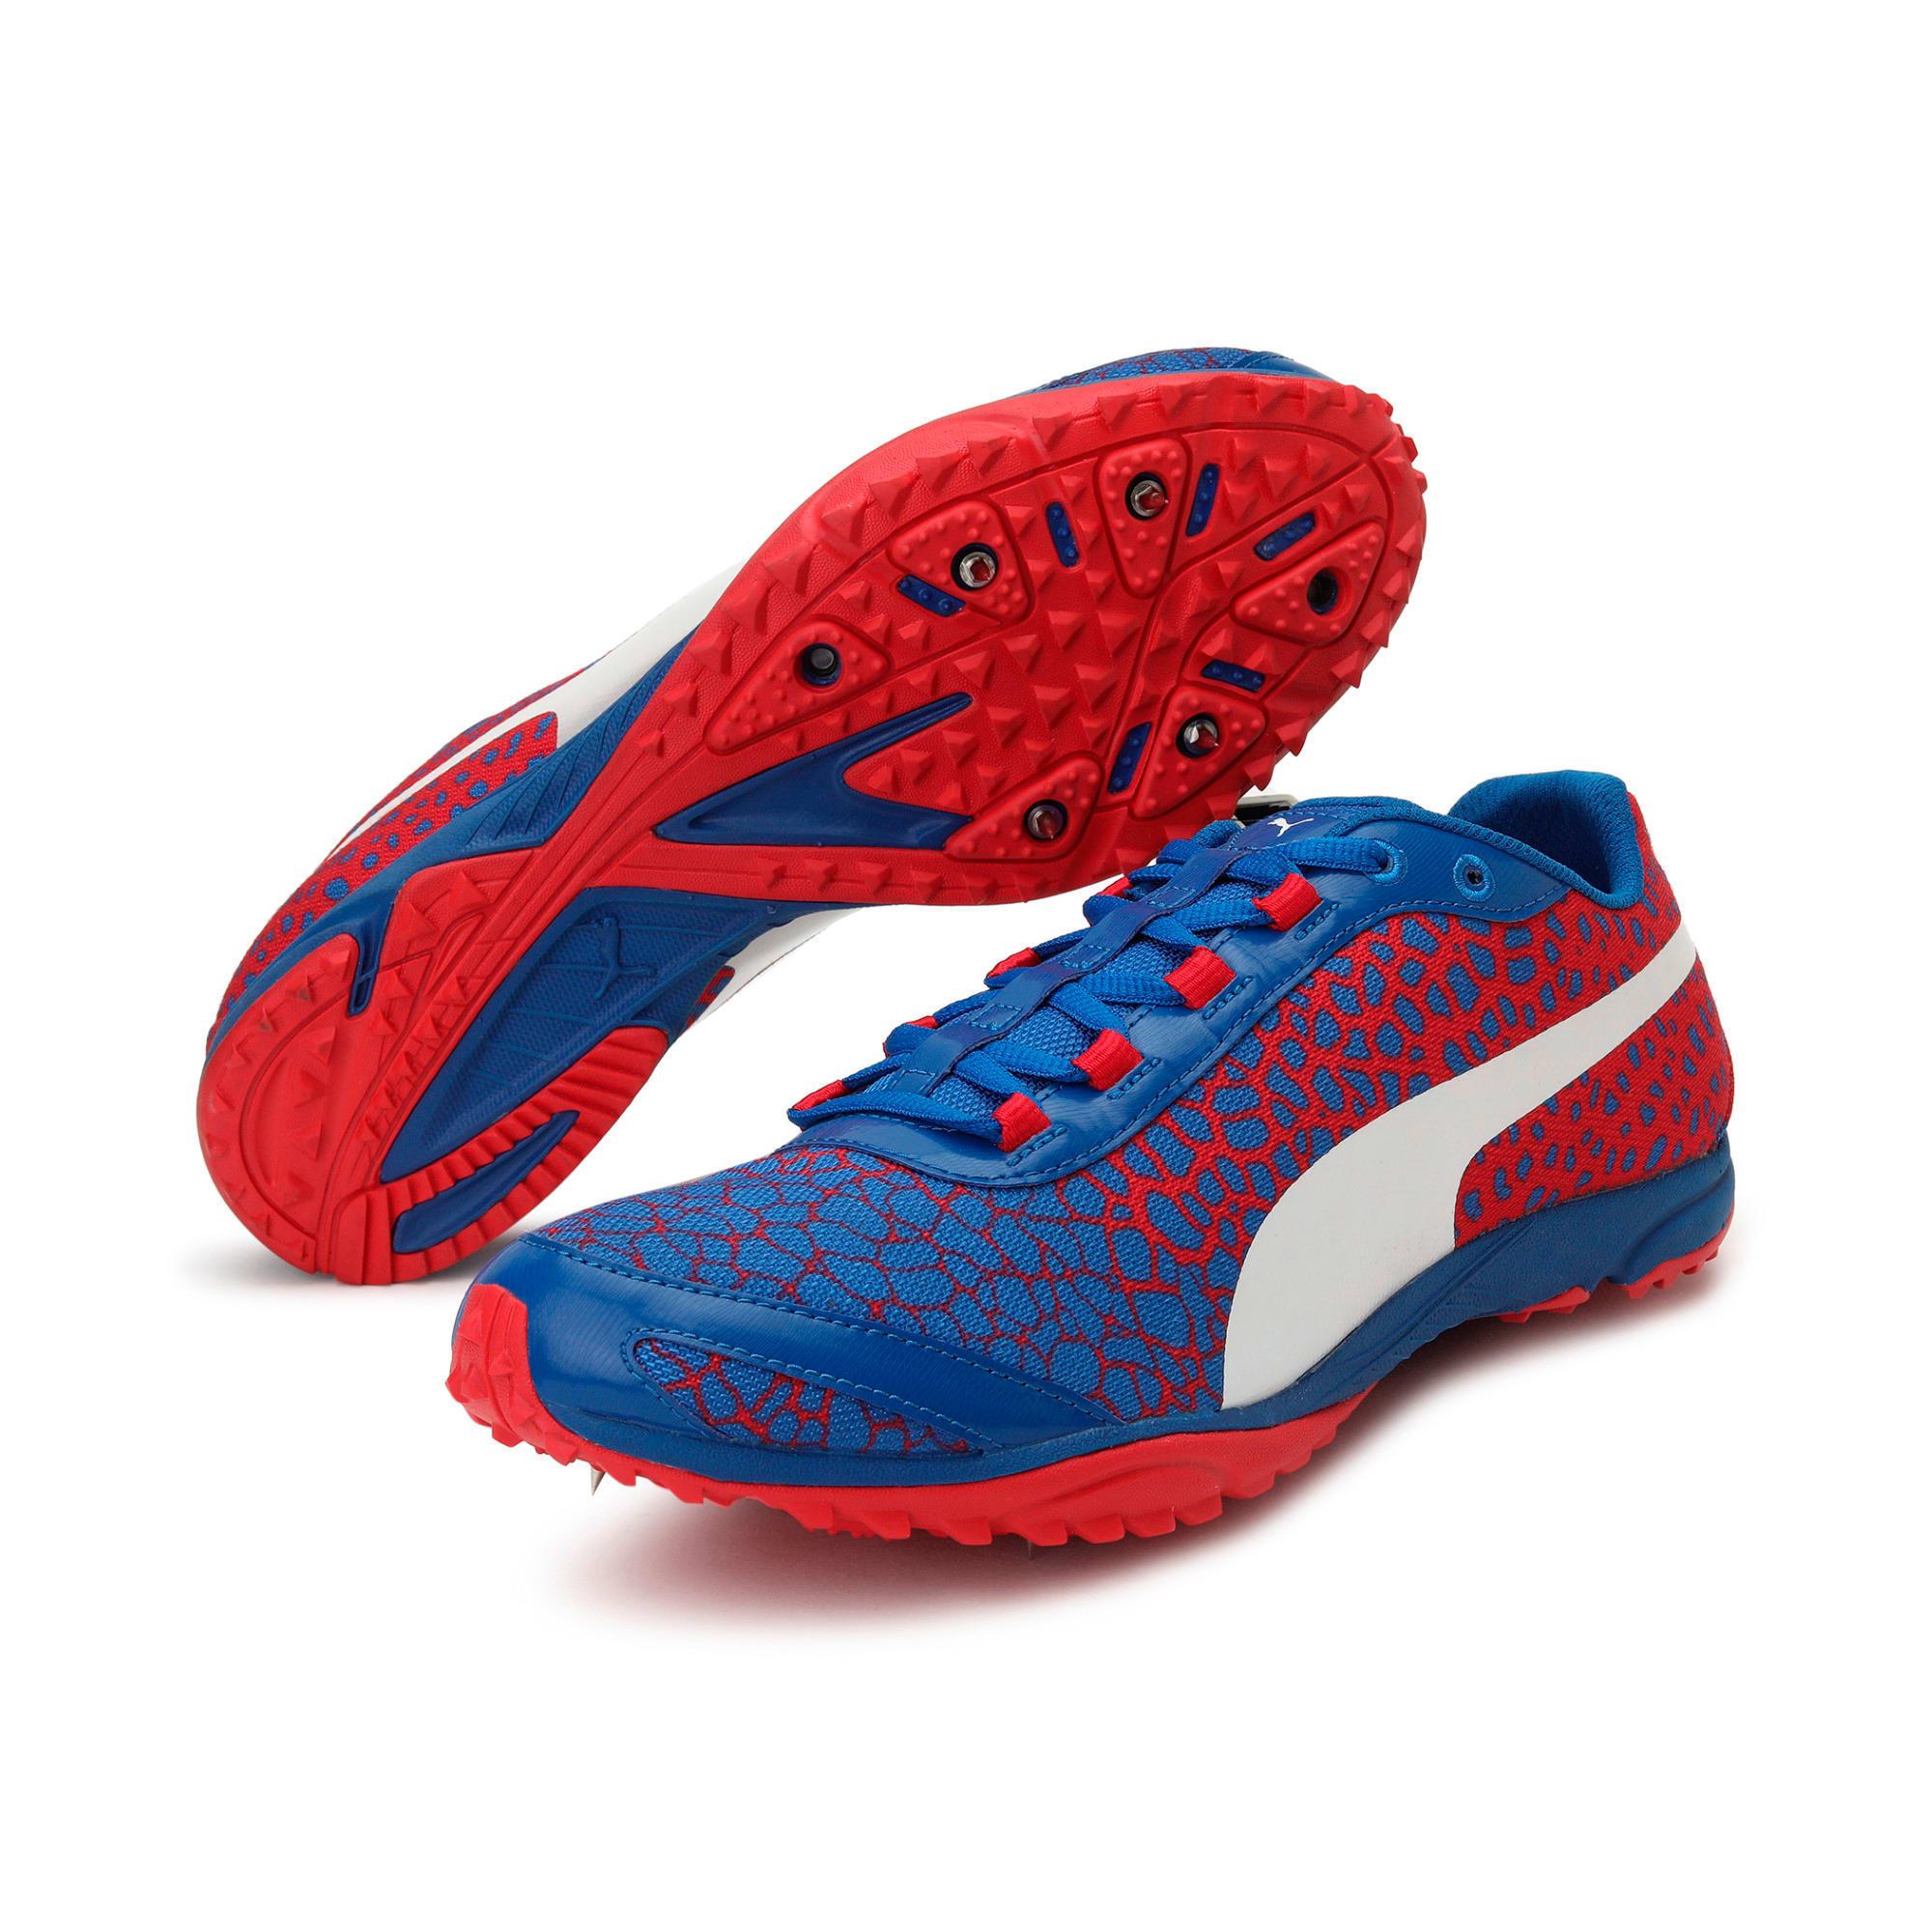 Thumbnail 2 of evoSPEED Haraka 4 Men's Cross Country Running Shoes, Lapis Blue-Toreador, medium-IND